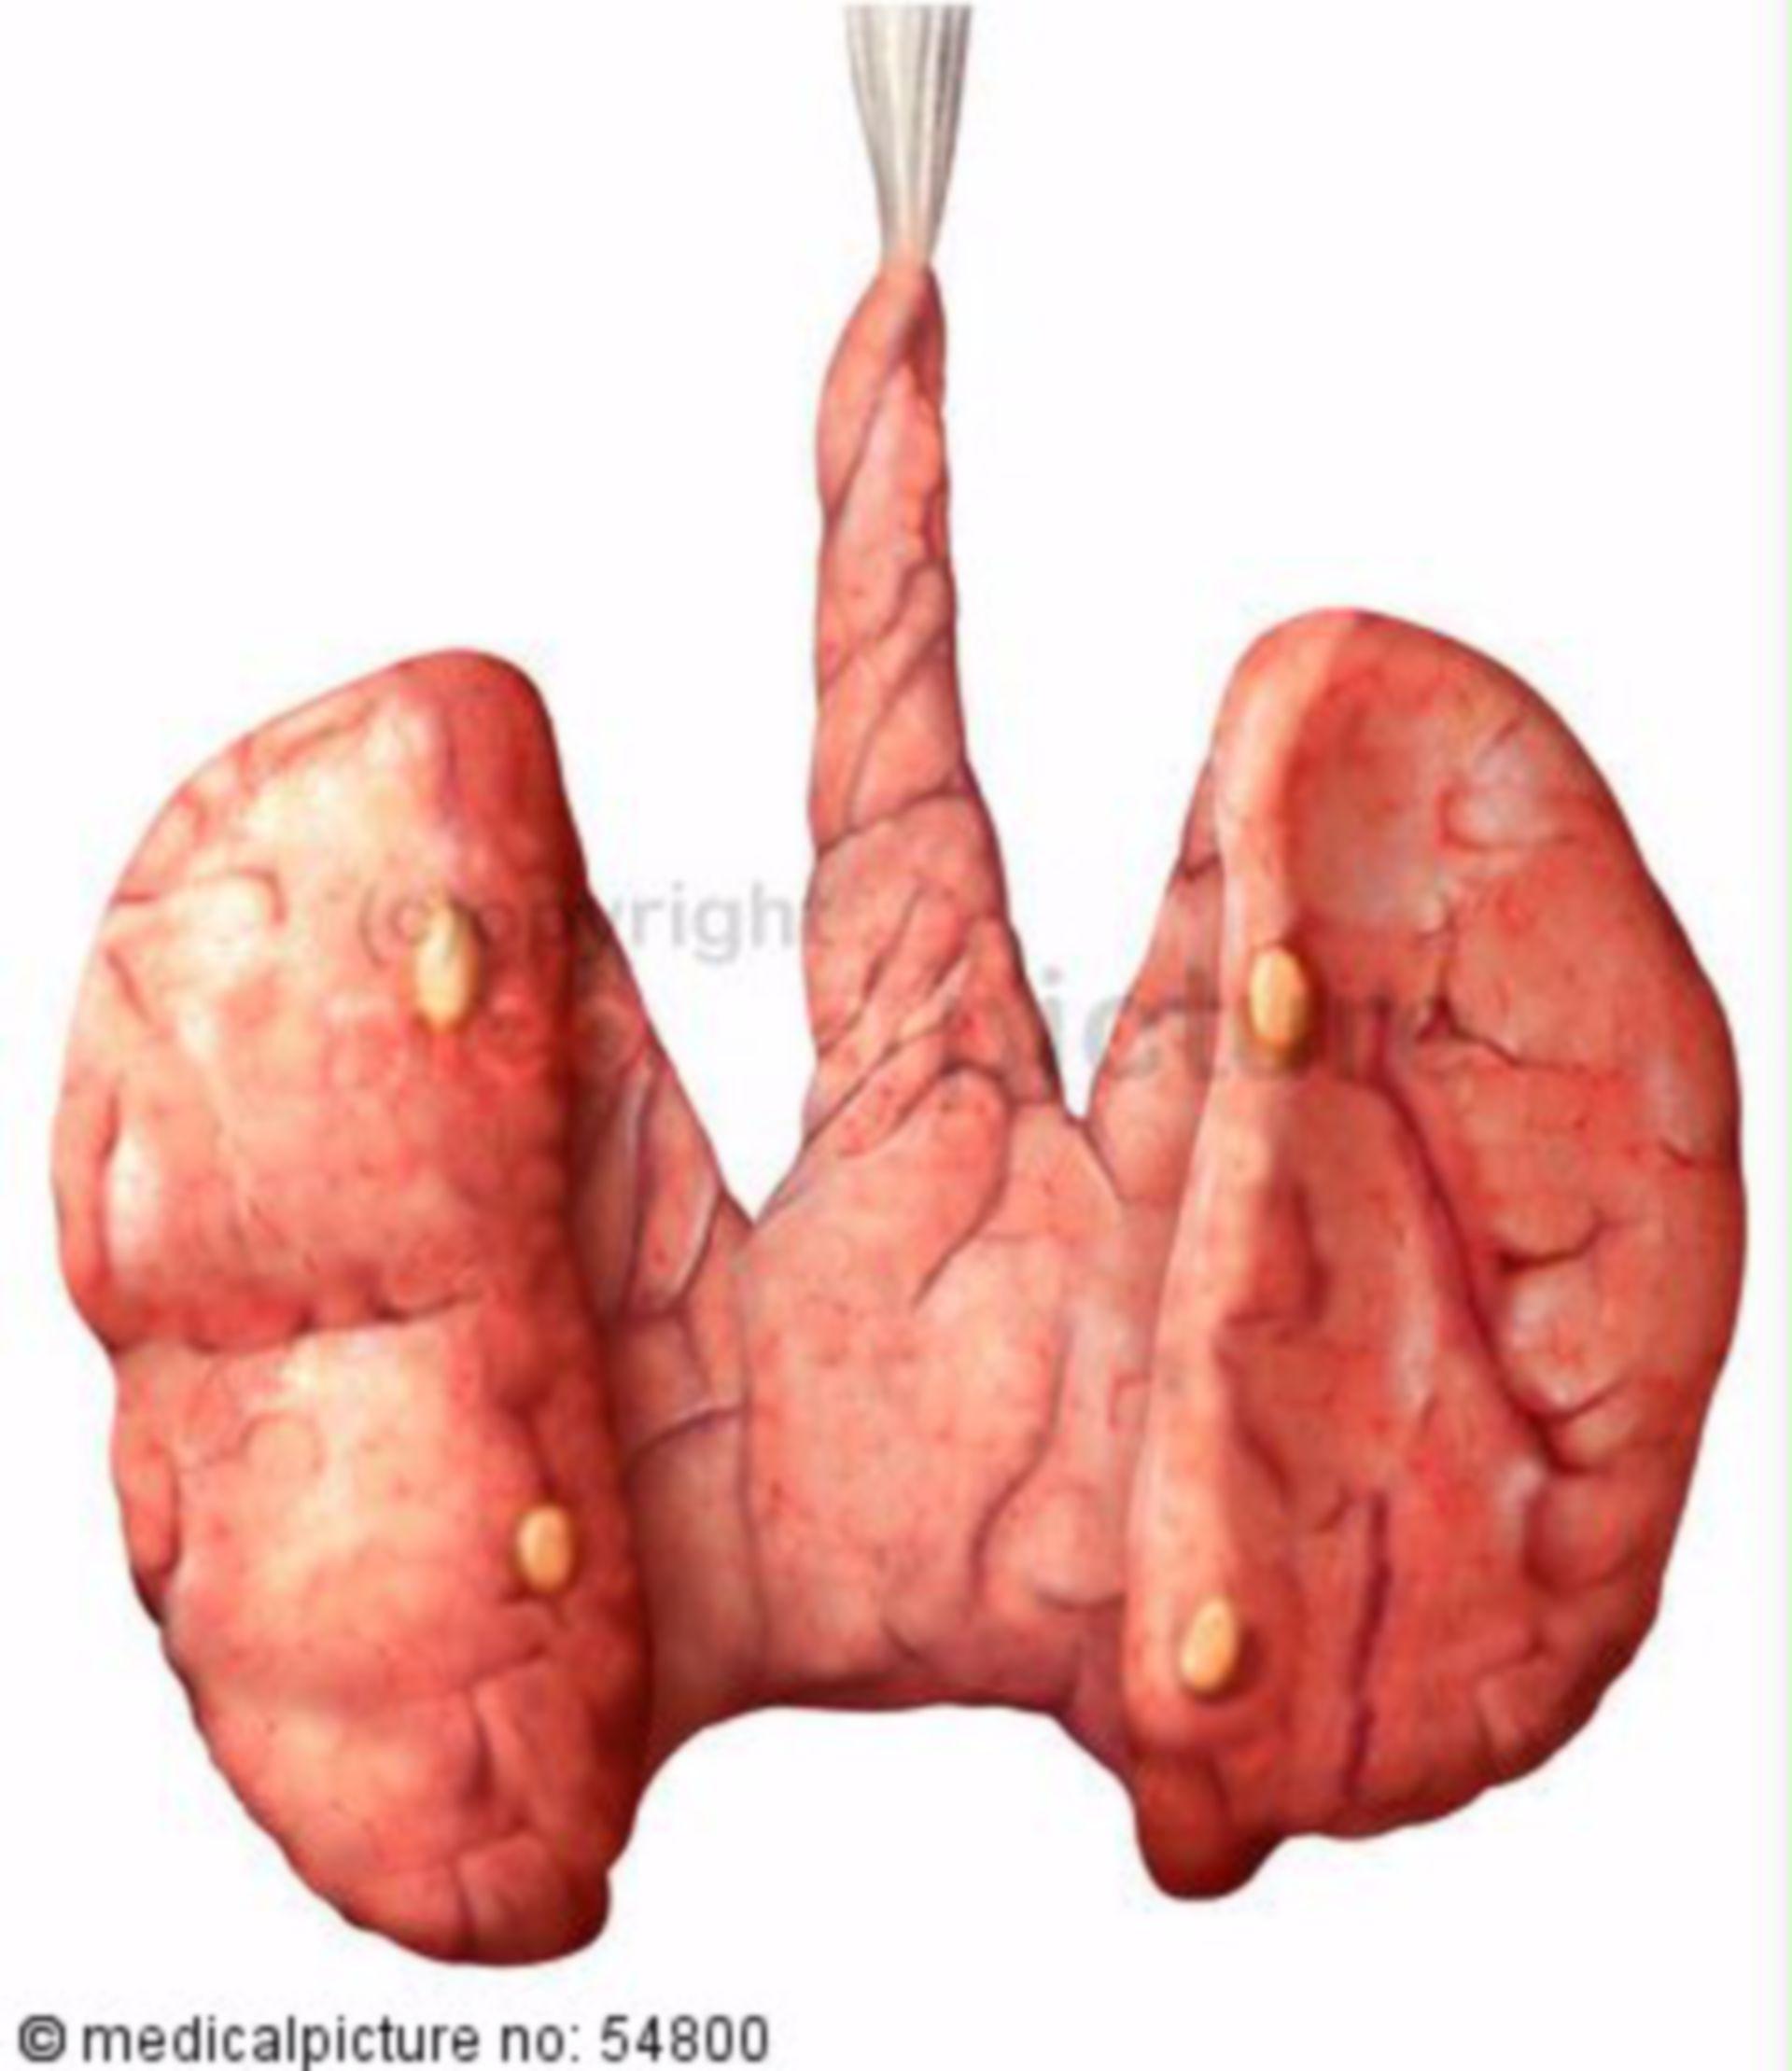 Thyroid and parathyroids